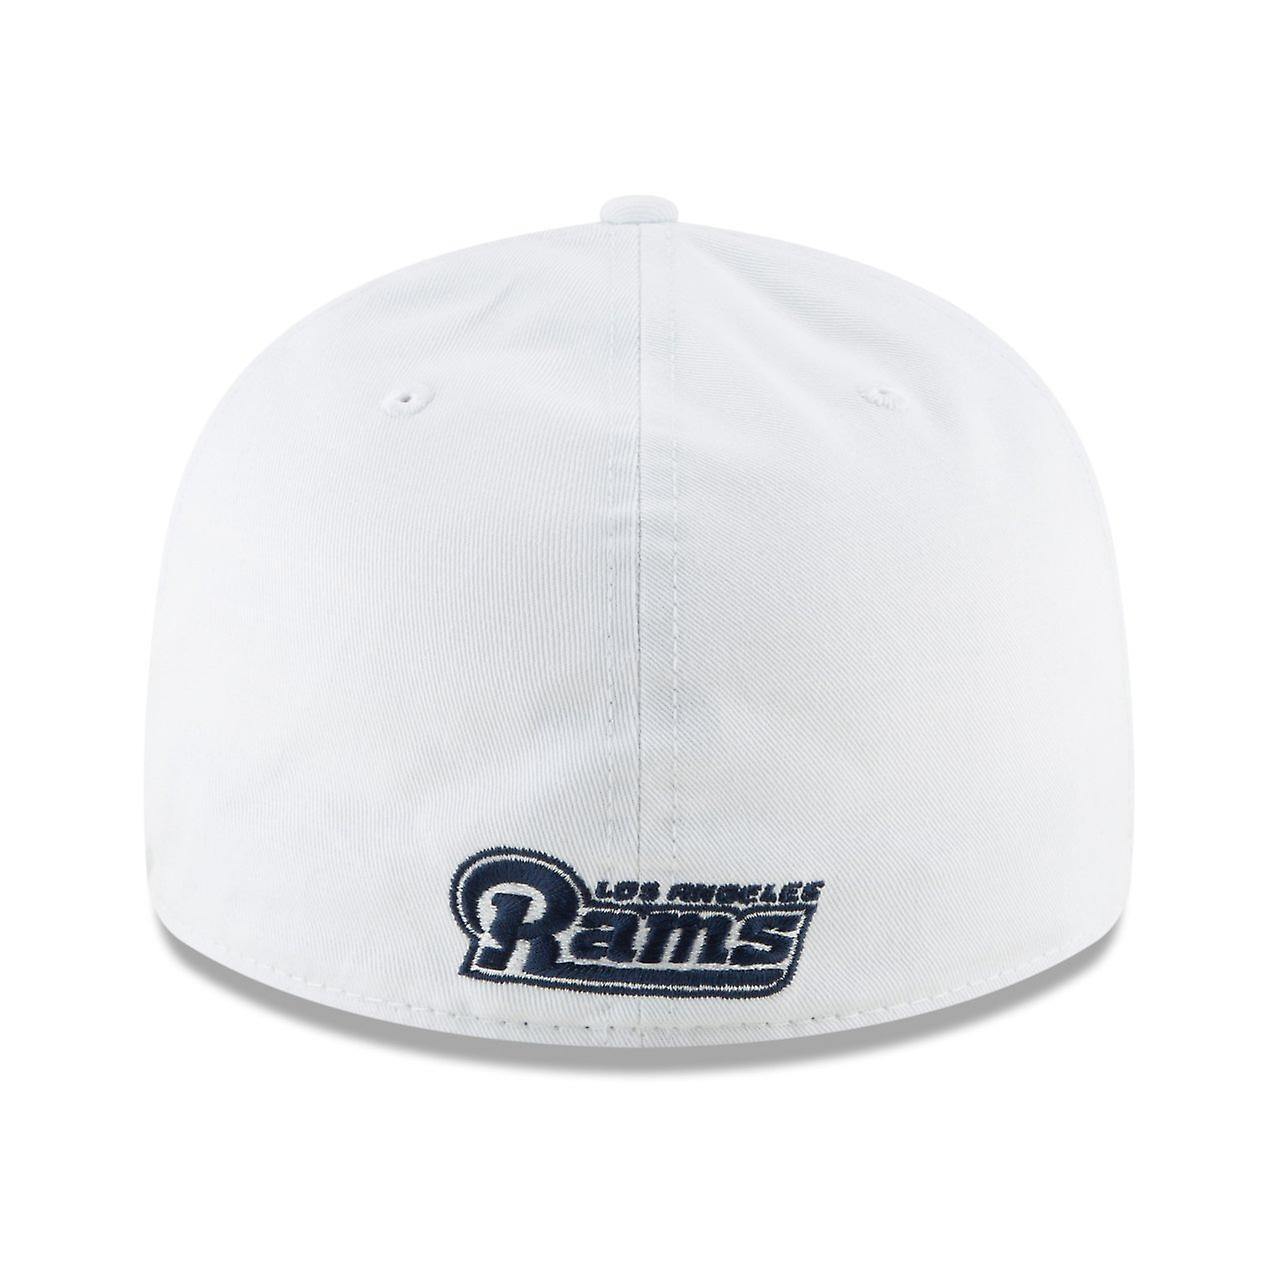 New Era 59Fifty LOW PROFILE Cap - Los Angeles Rams